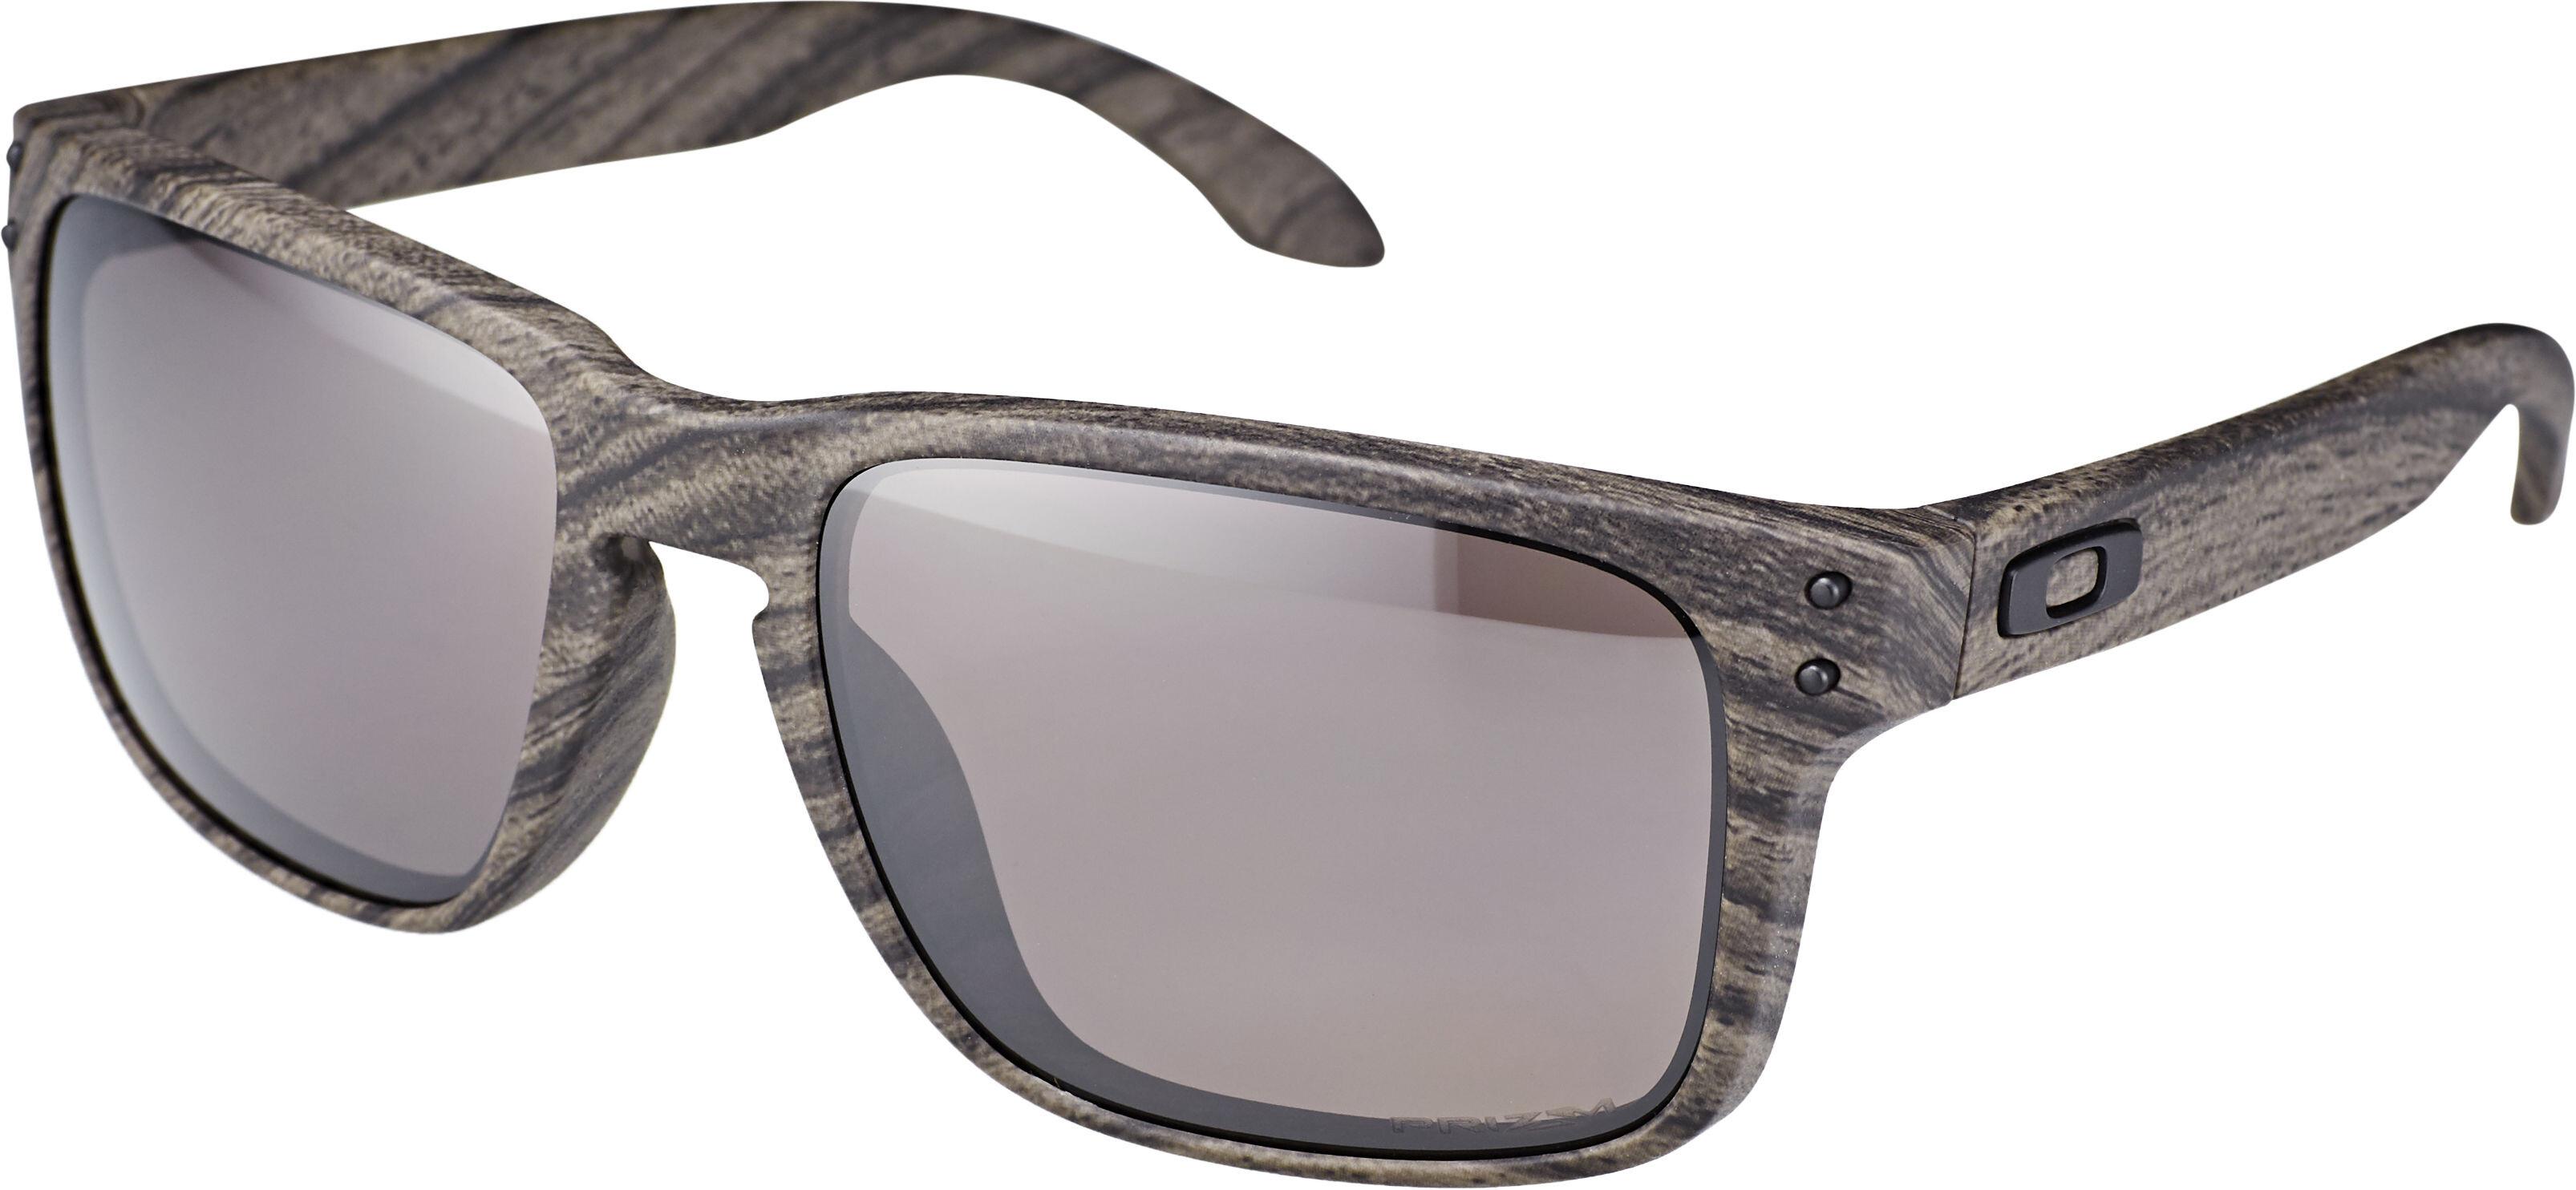 34346e7bbfa4 Oakley Holbrook Sunglasses woodgrain/prizm daily polarized at ...